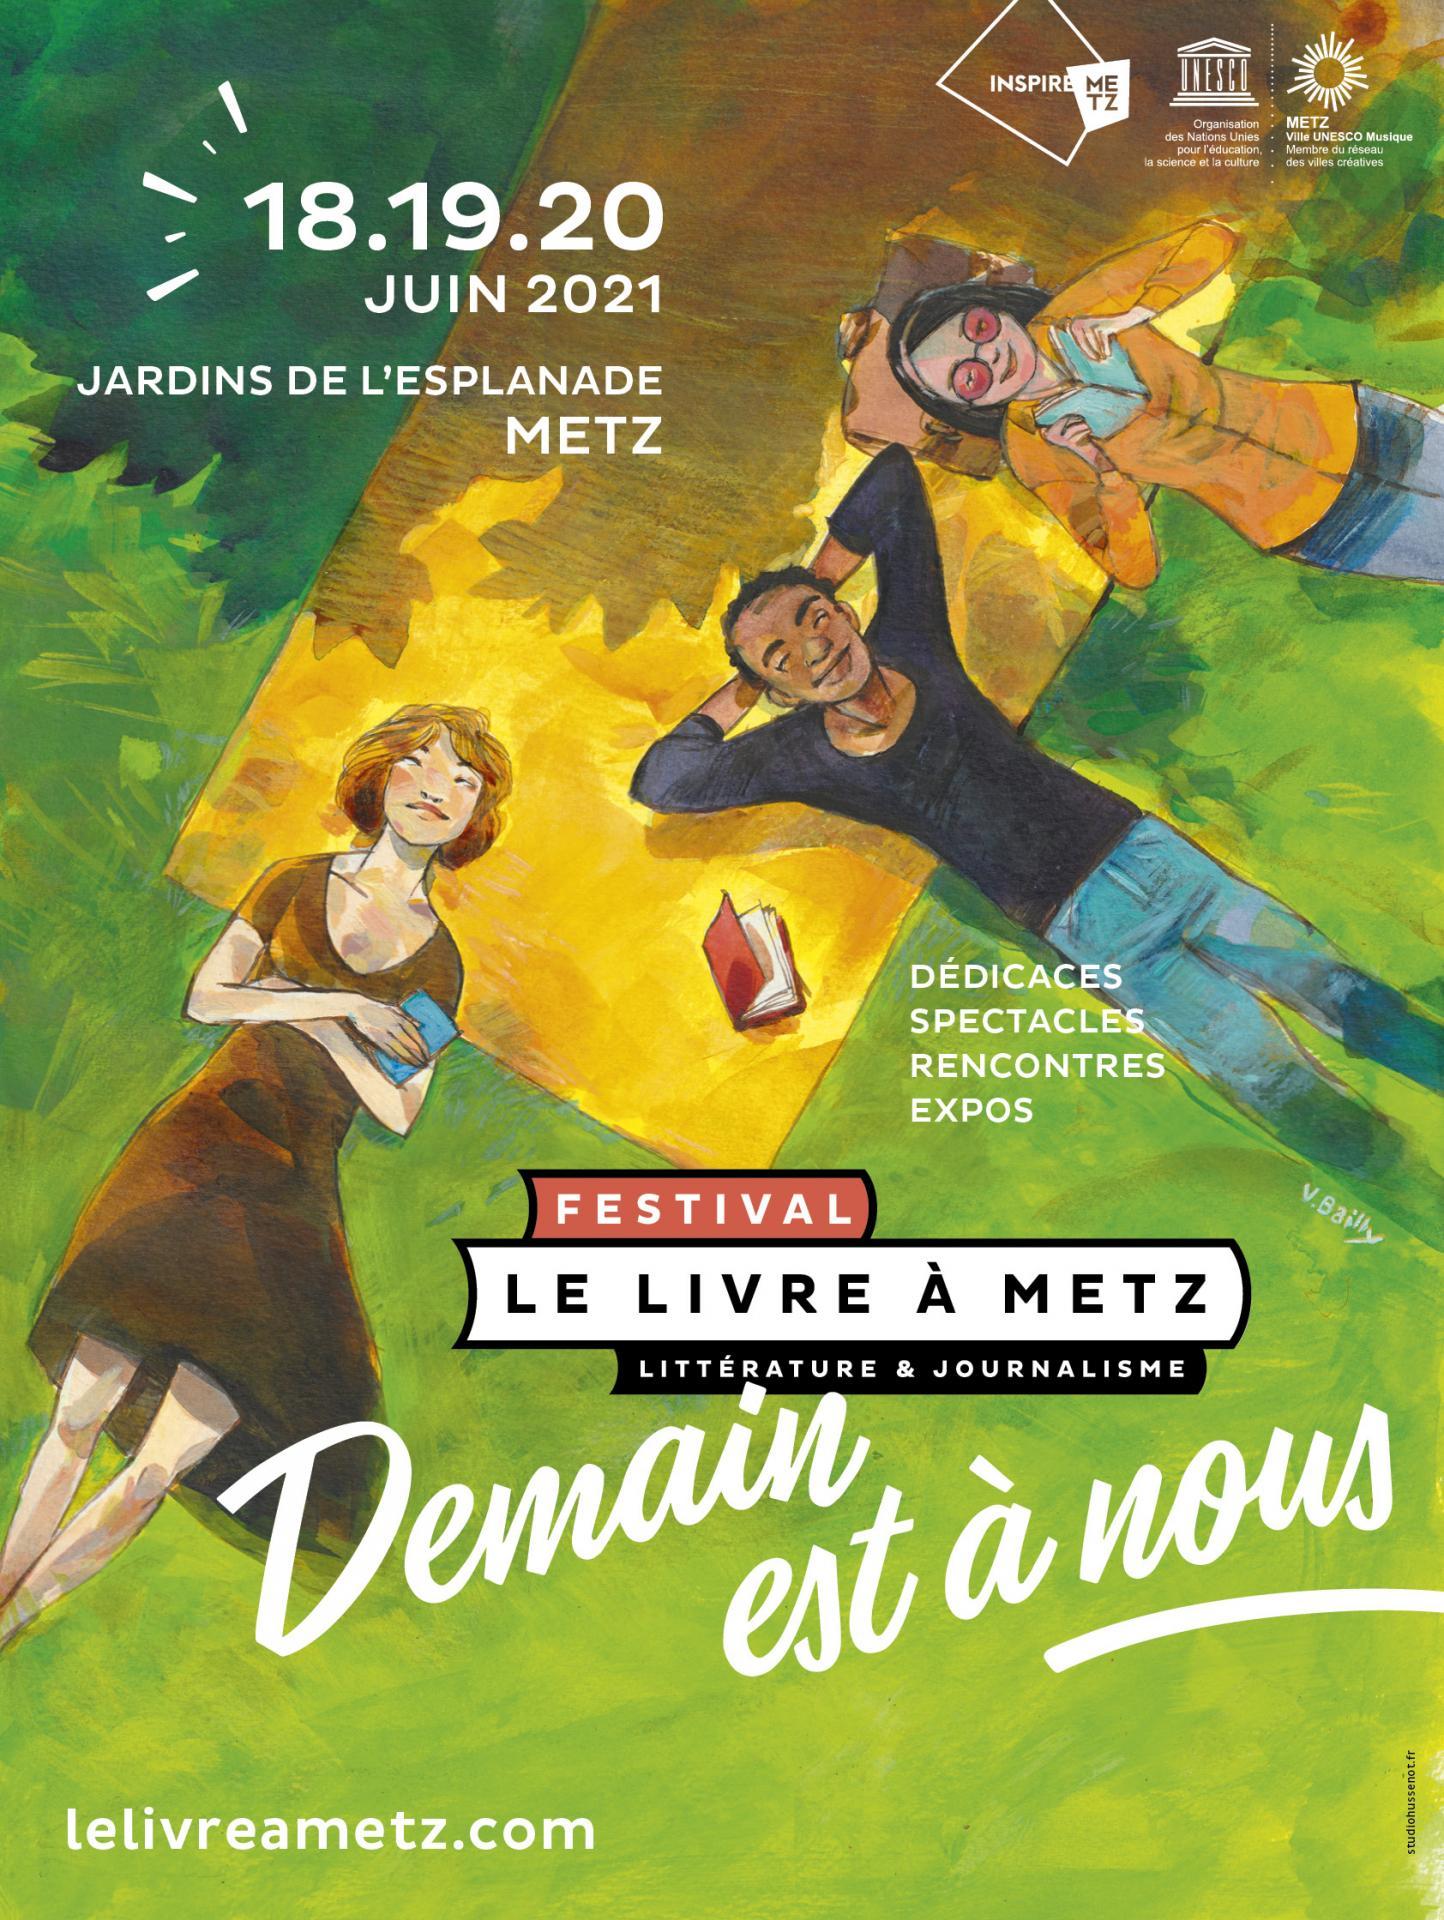 Bientôt, CulturActu sera à Metz ! Tout savoir.